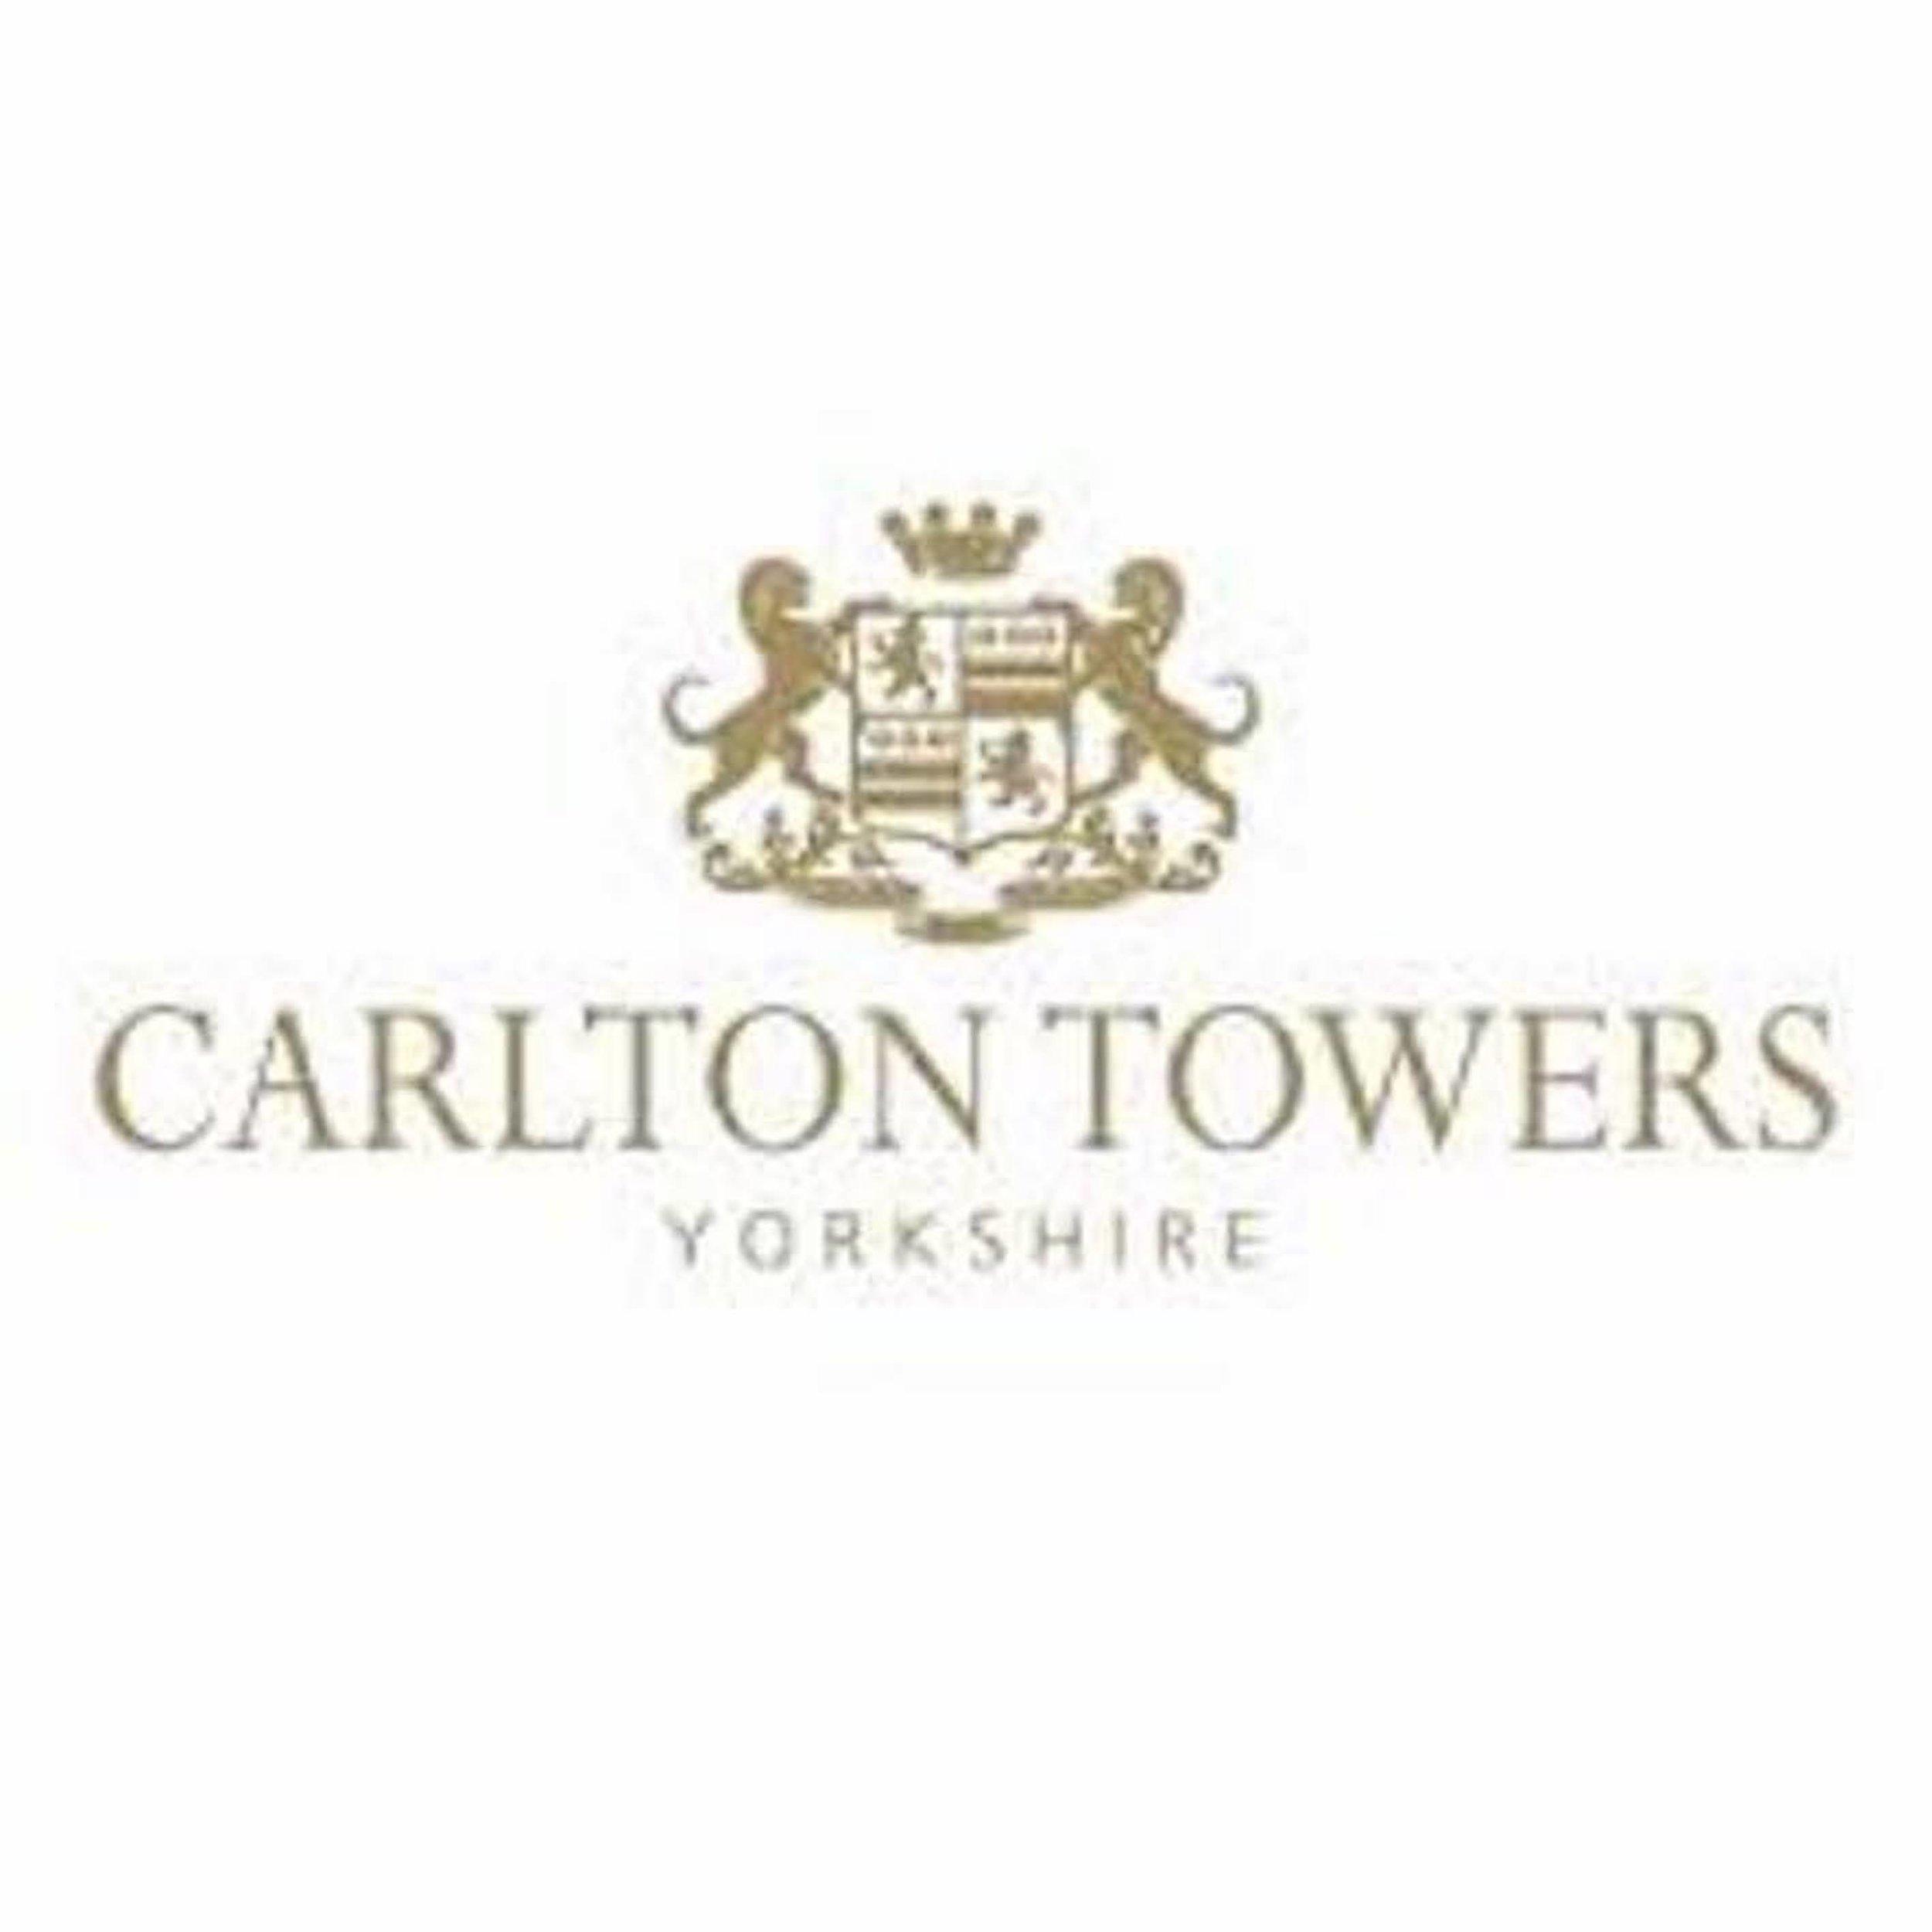 Carlton Towers logo.jpg